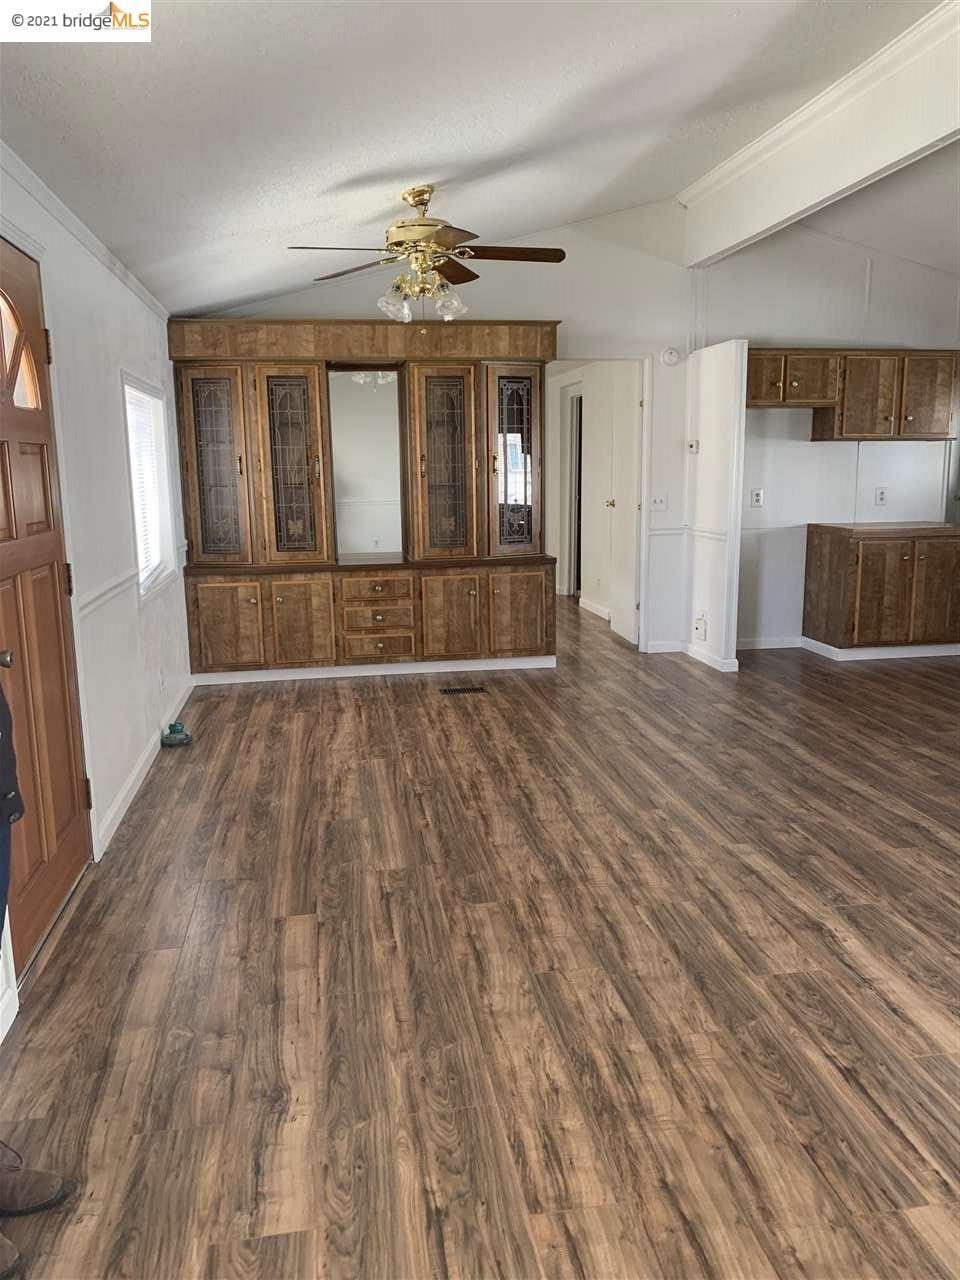 Photo of 210 W Cypress Rd #TRLR 4, OAKLEY, CA 94561 (MLS # 40940819)